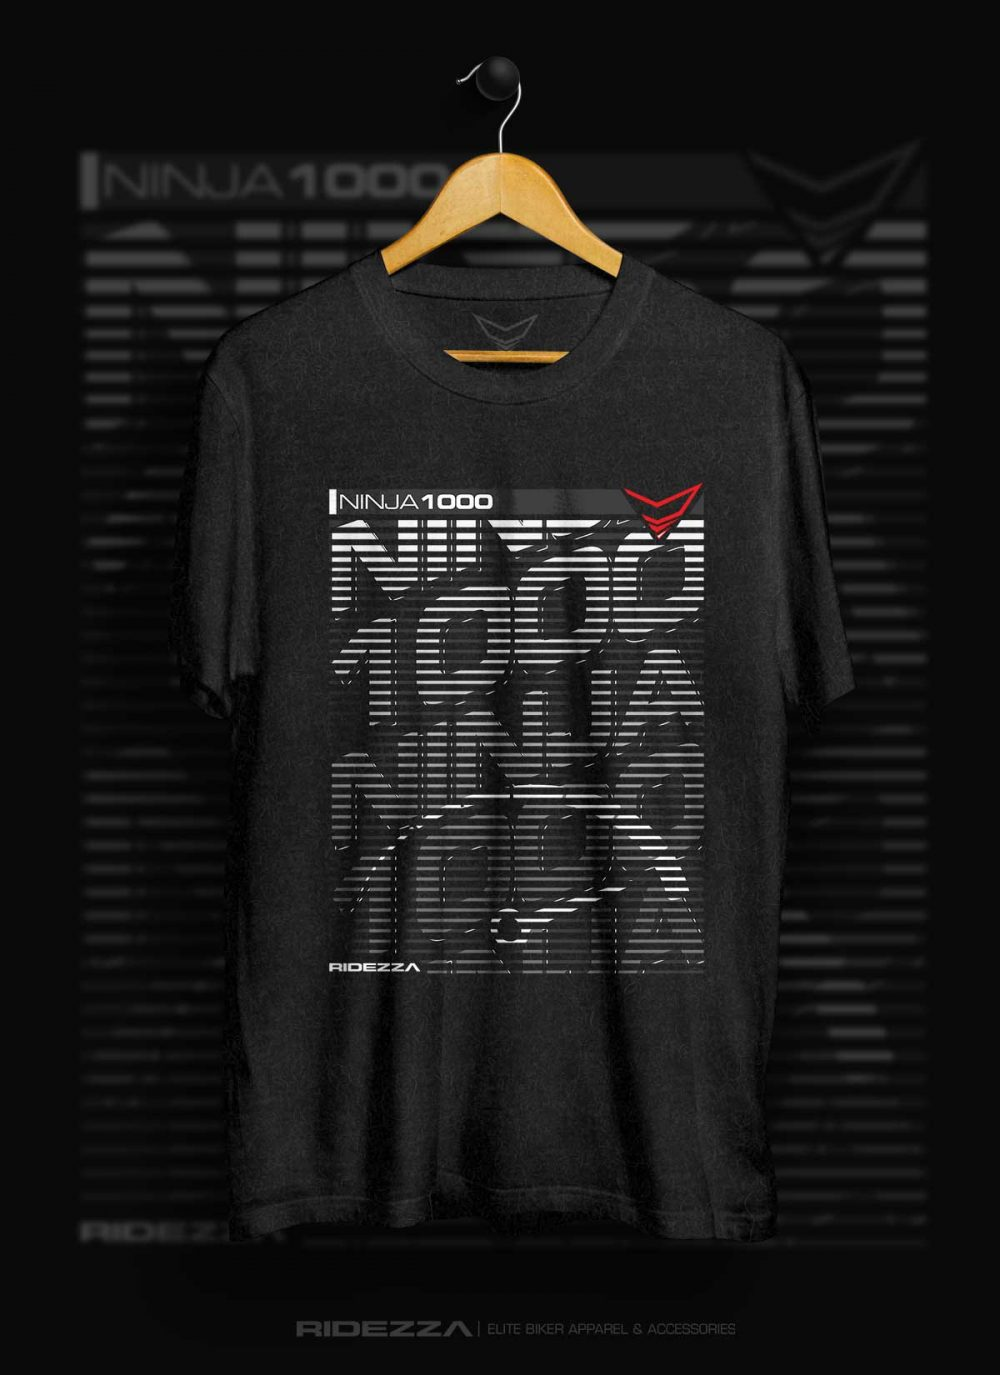 Kawasaki Ninja 1000 Speedy T-Shirt